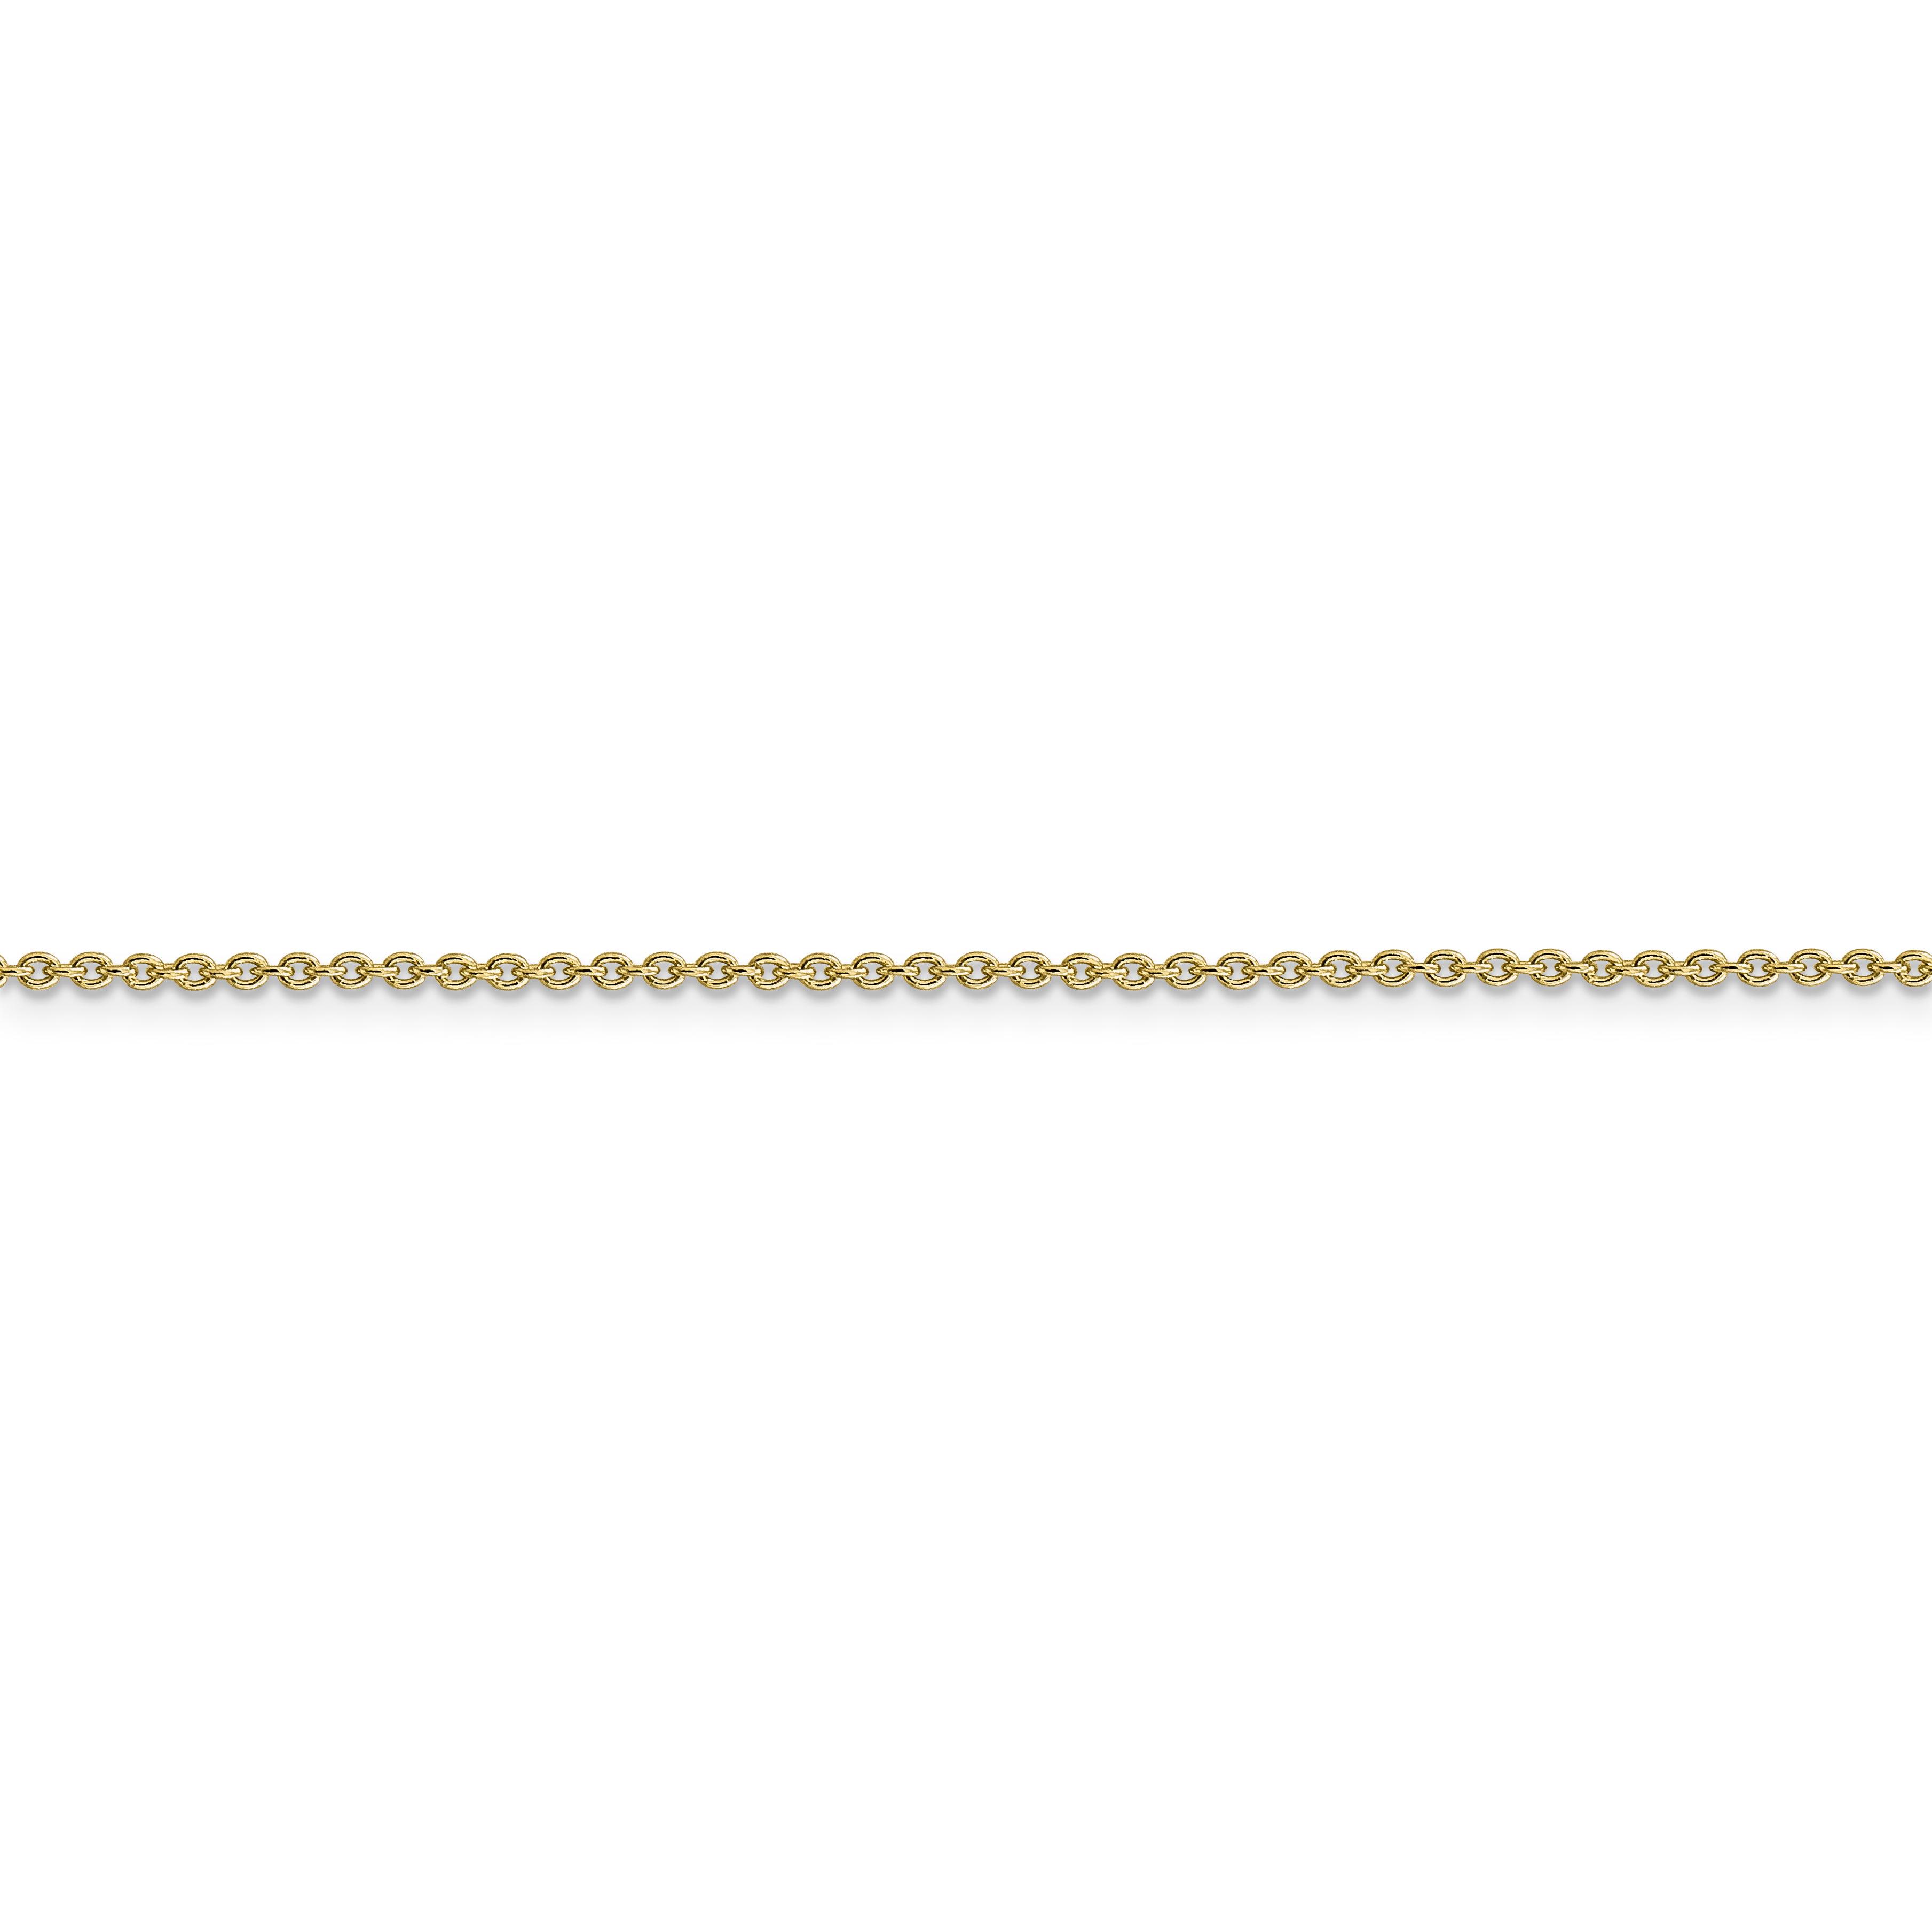 14K Yellow Gold 1.4 MM Solid Polished Cable Anklet Bracelet 9